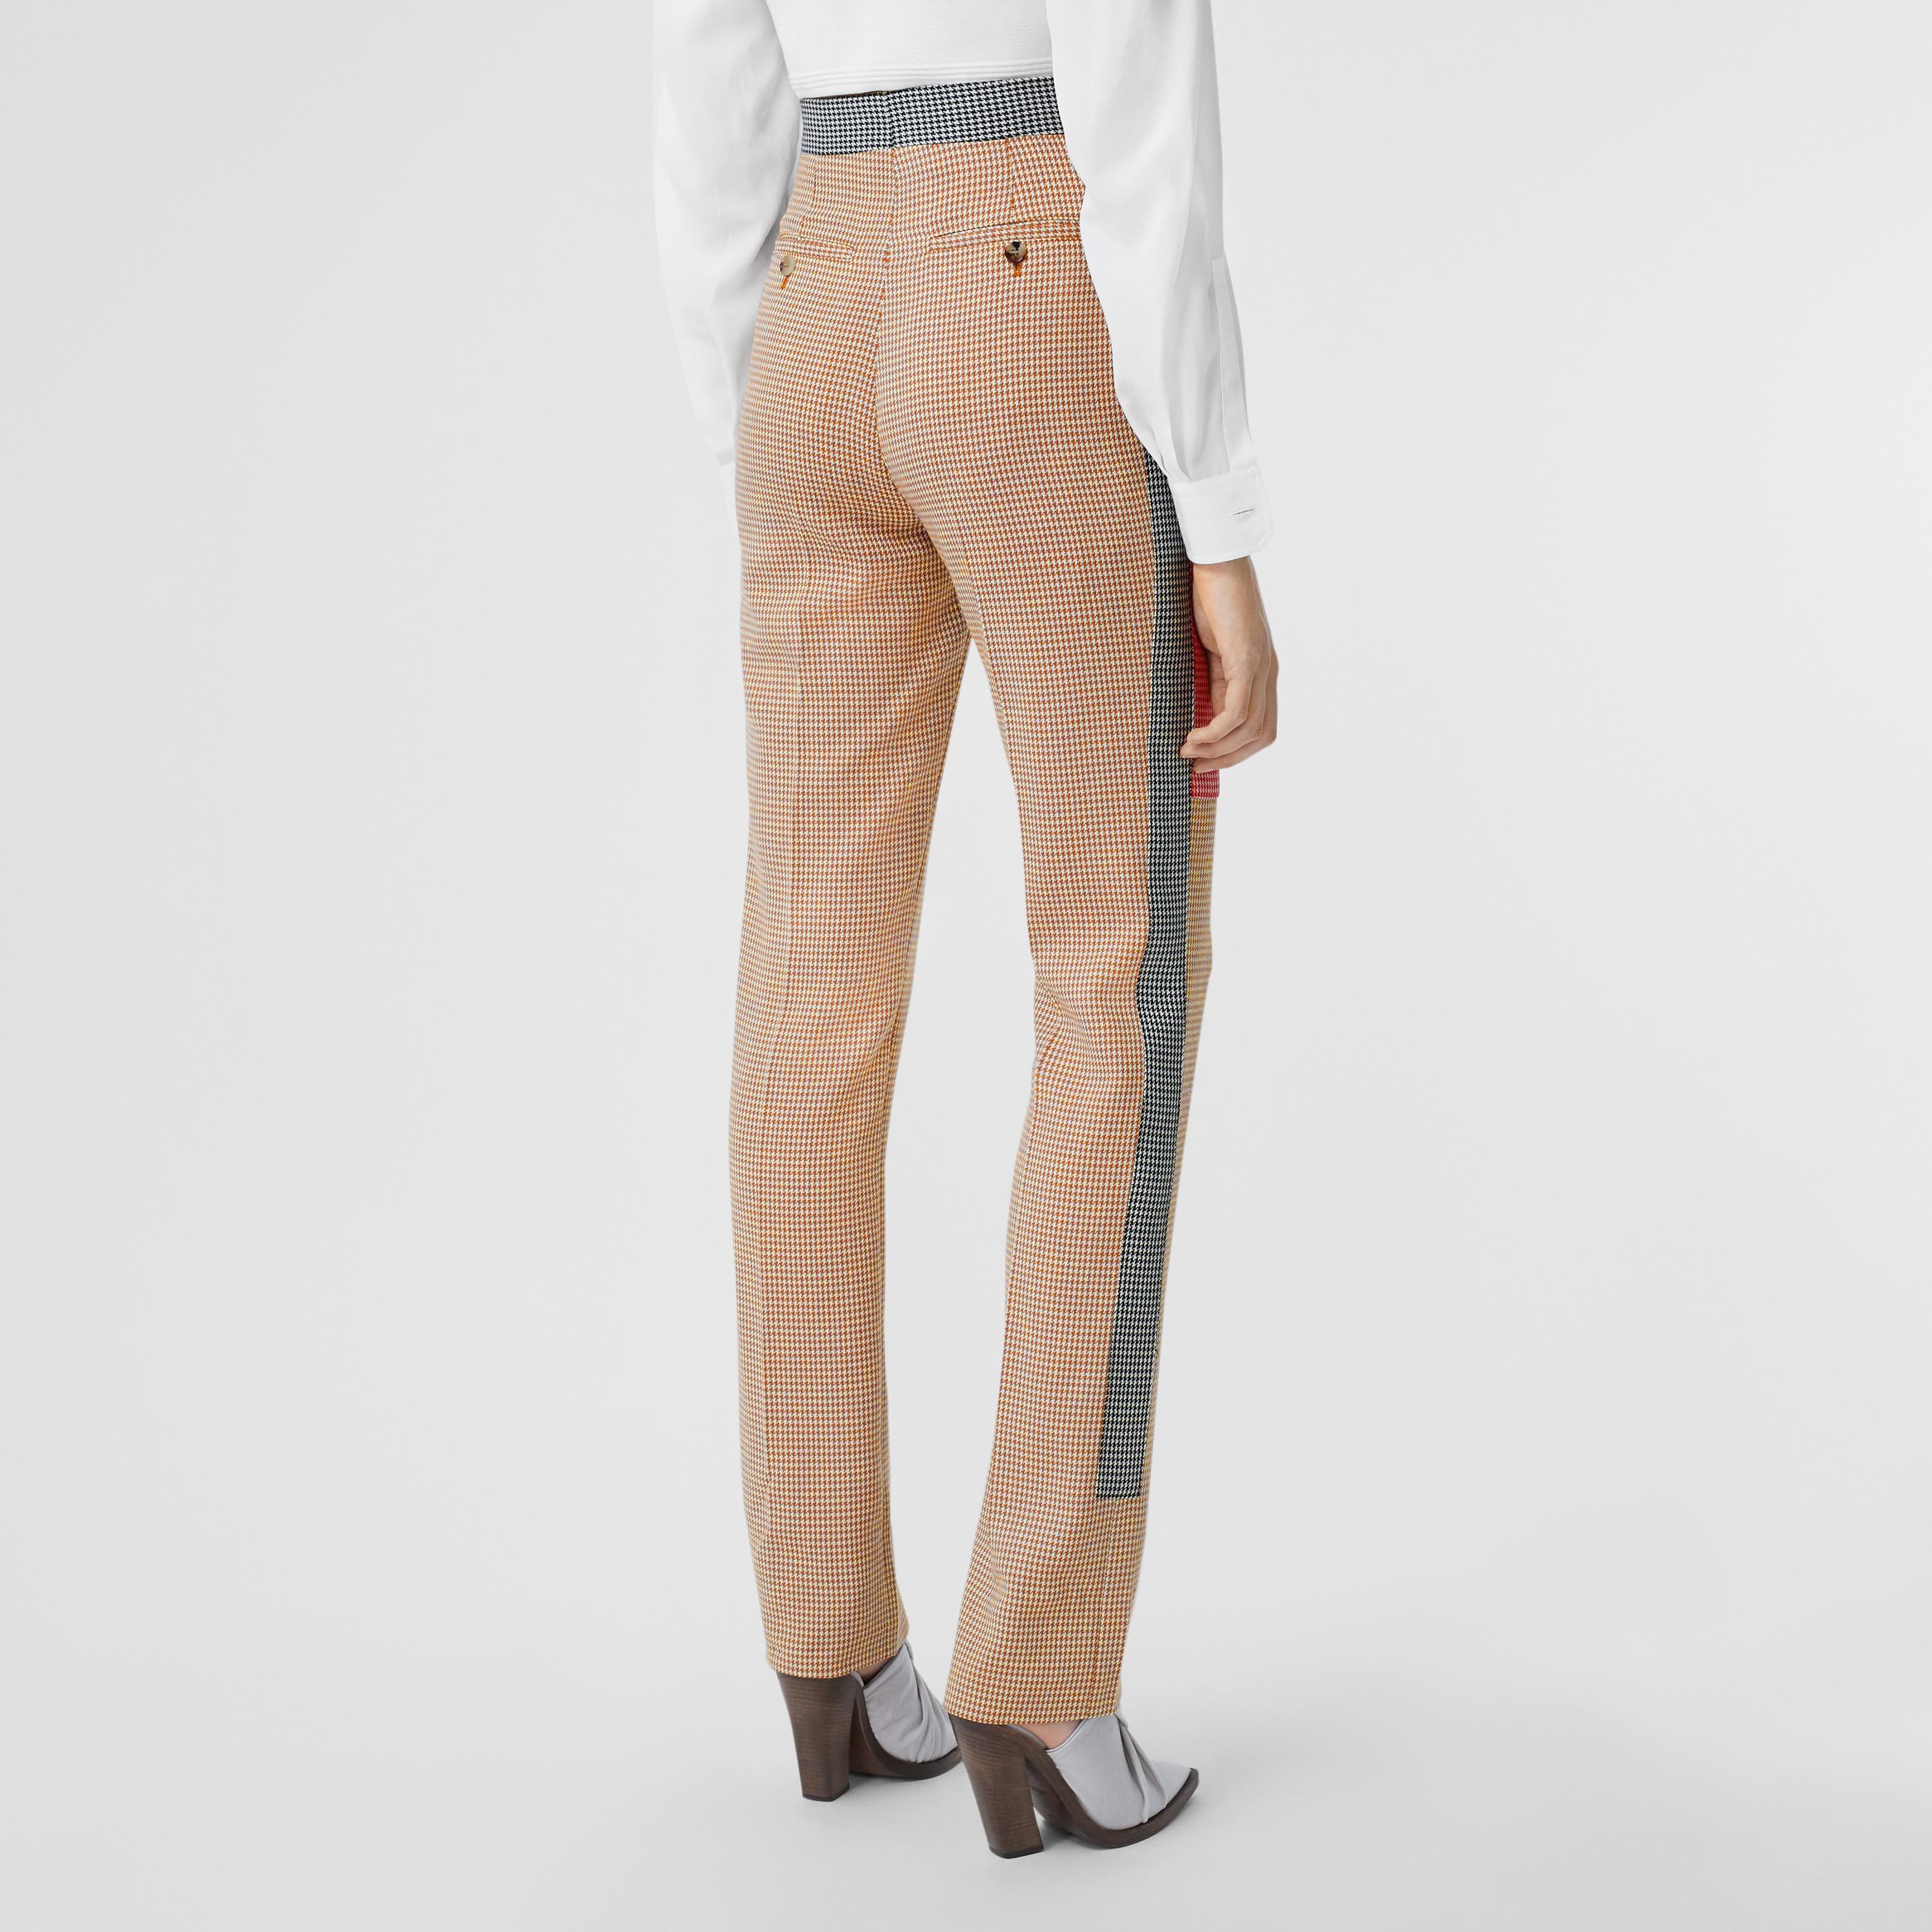 Pantaloni sartoriali in lana con motivo pied-de-poule (Bronzo) - Donna | Burberry - 3